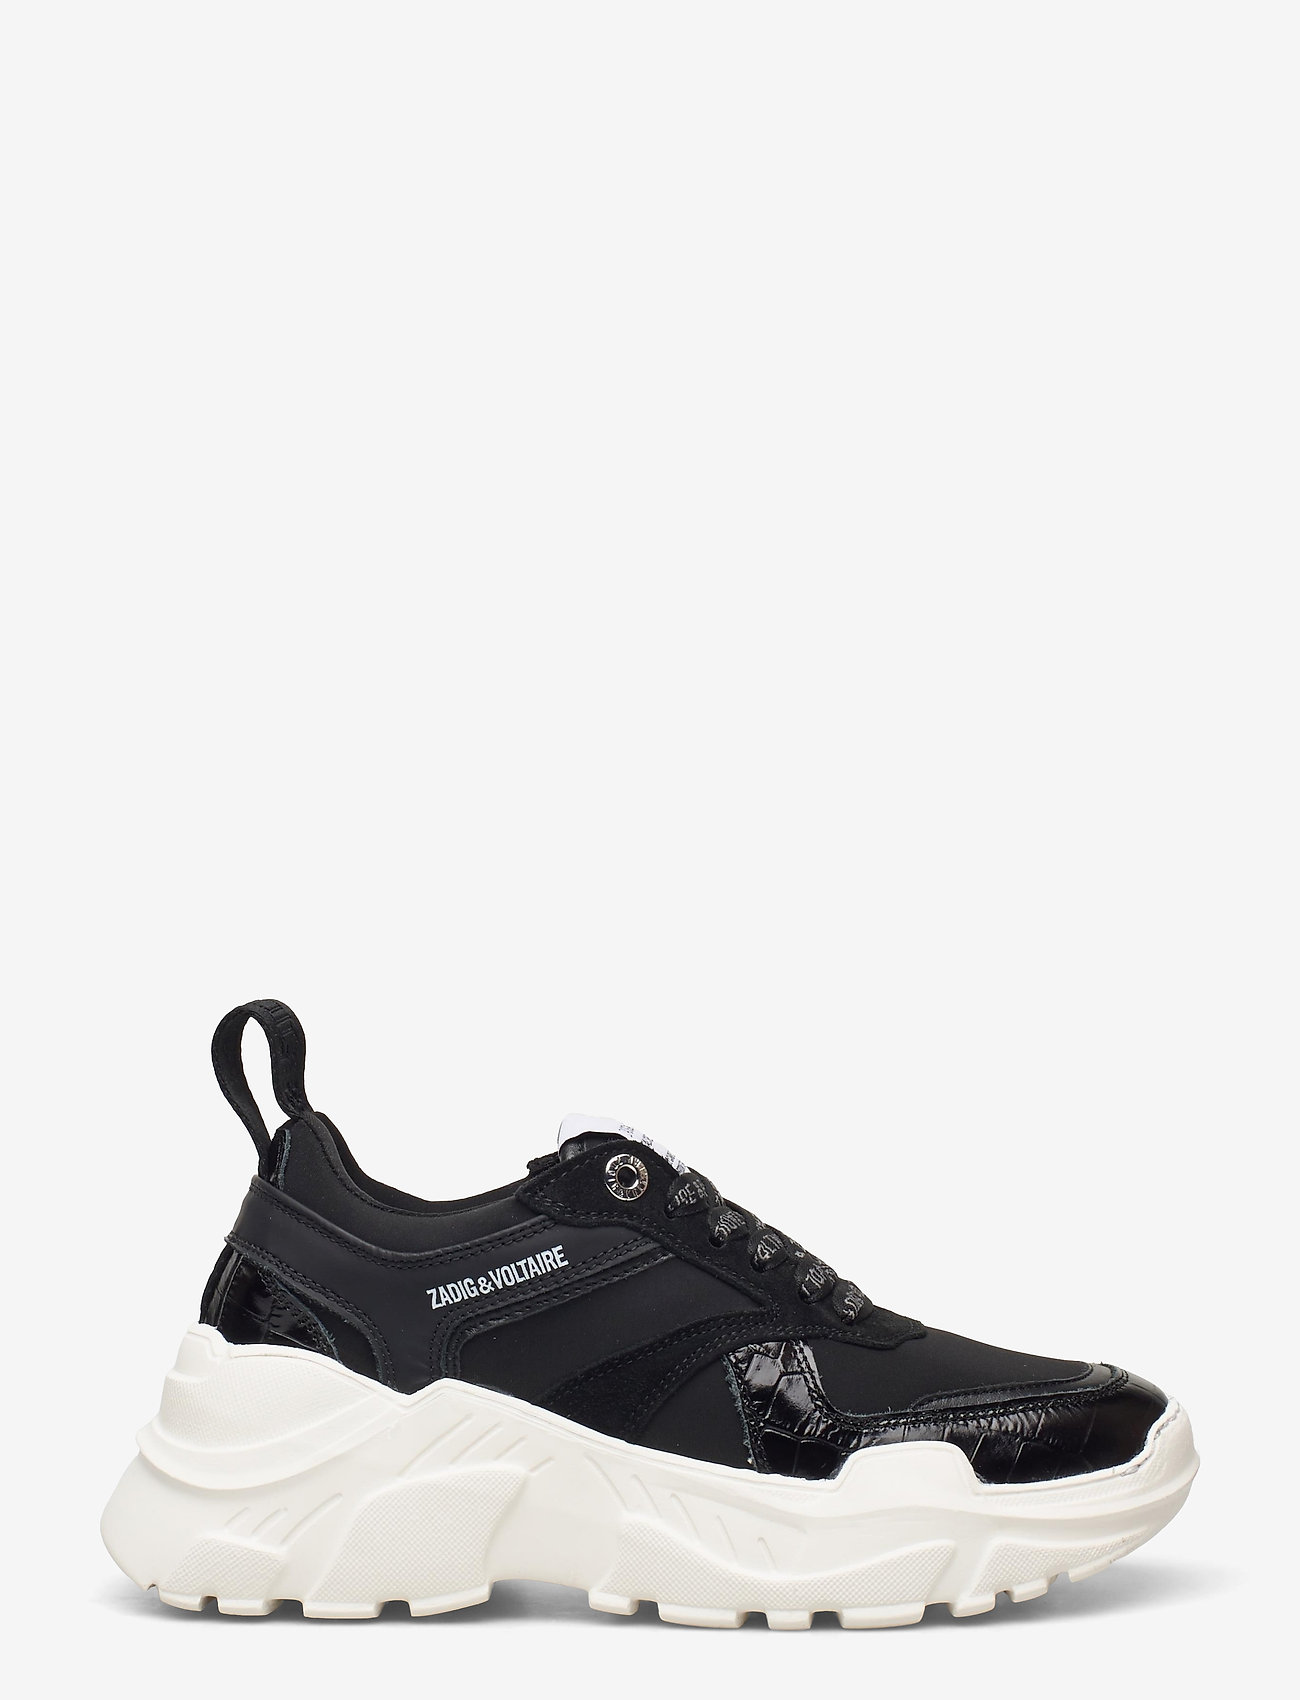 Zadig & Voltaire - FUTURE EMBOSSED CROCO + MIX NEOPRENE - chunky sneakers - black - 1